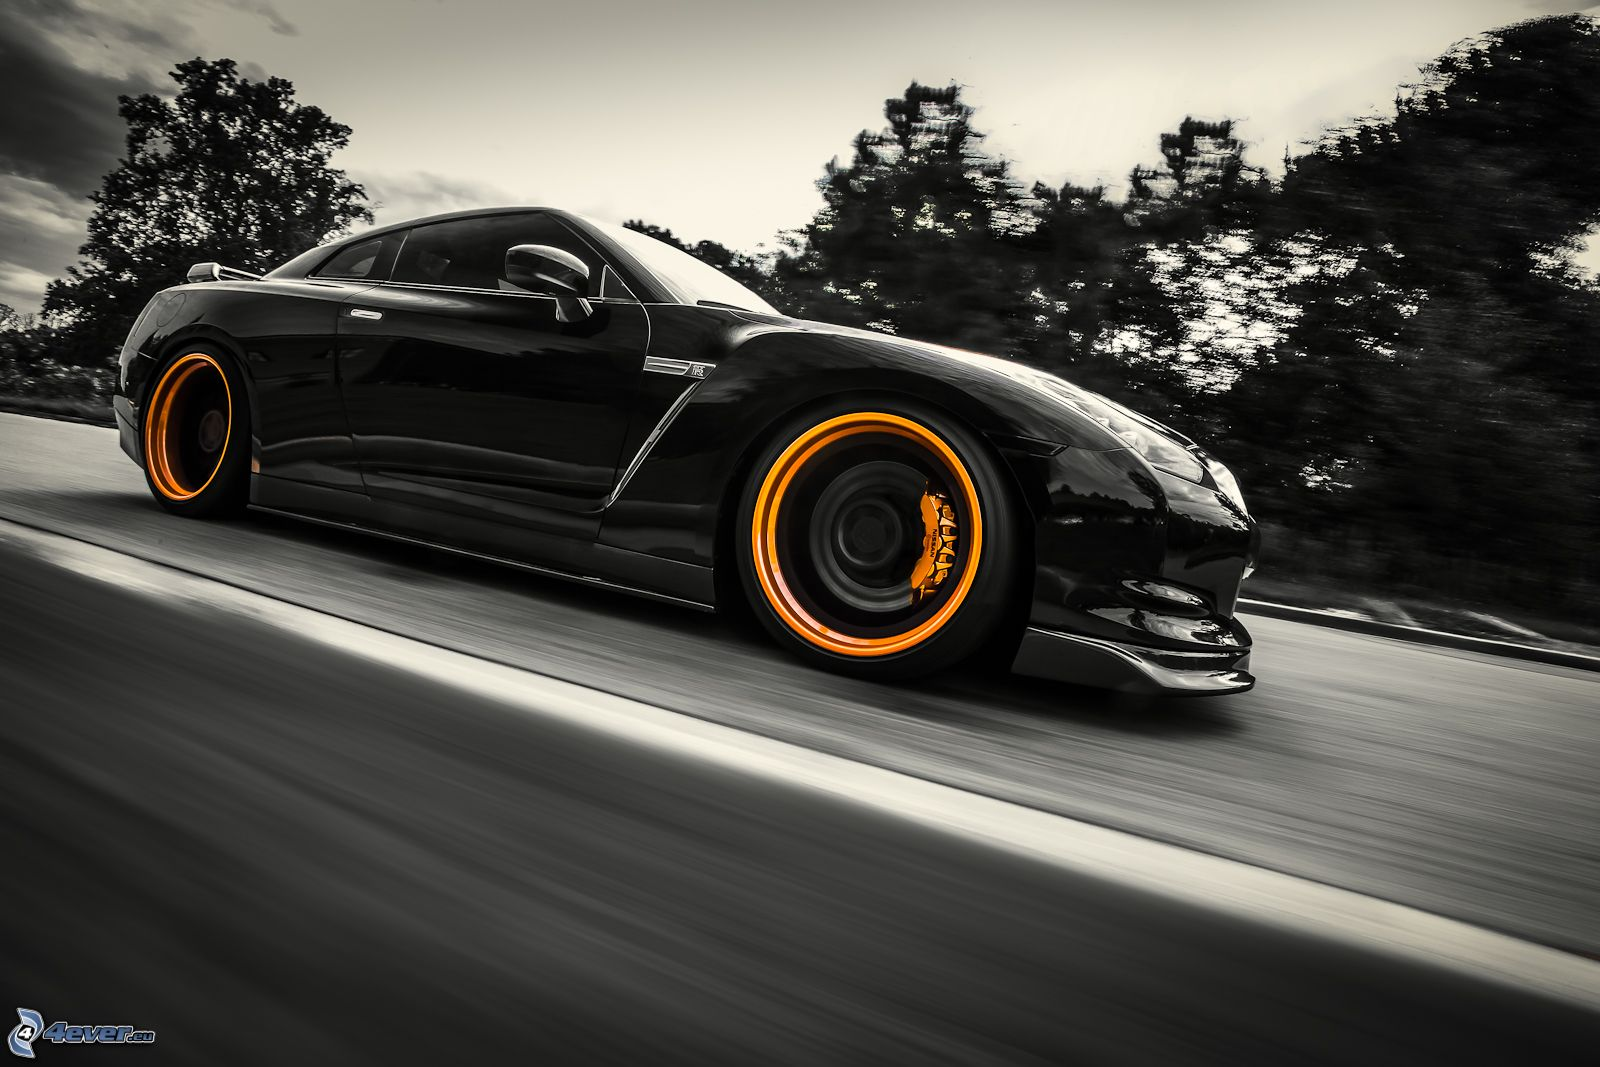 Nissan nissan deportivos nissan gt r nissan gt r r35 tuning cars -  Gtr 350 Y 370z Tuning Imagenes Google Nissan